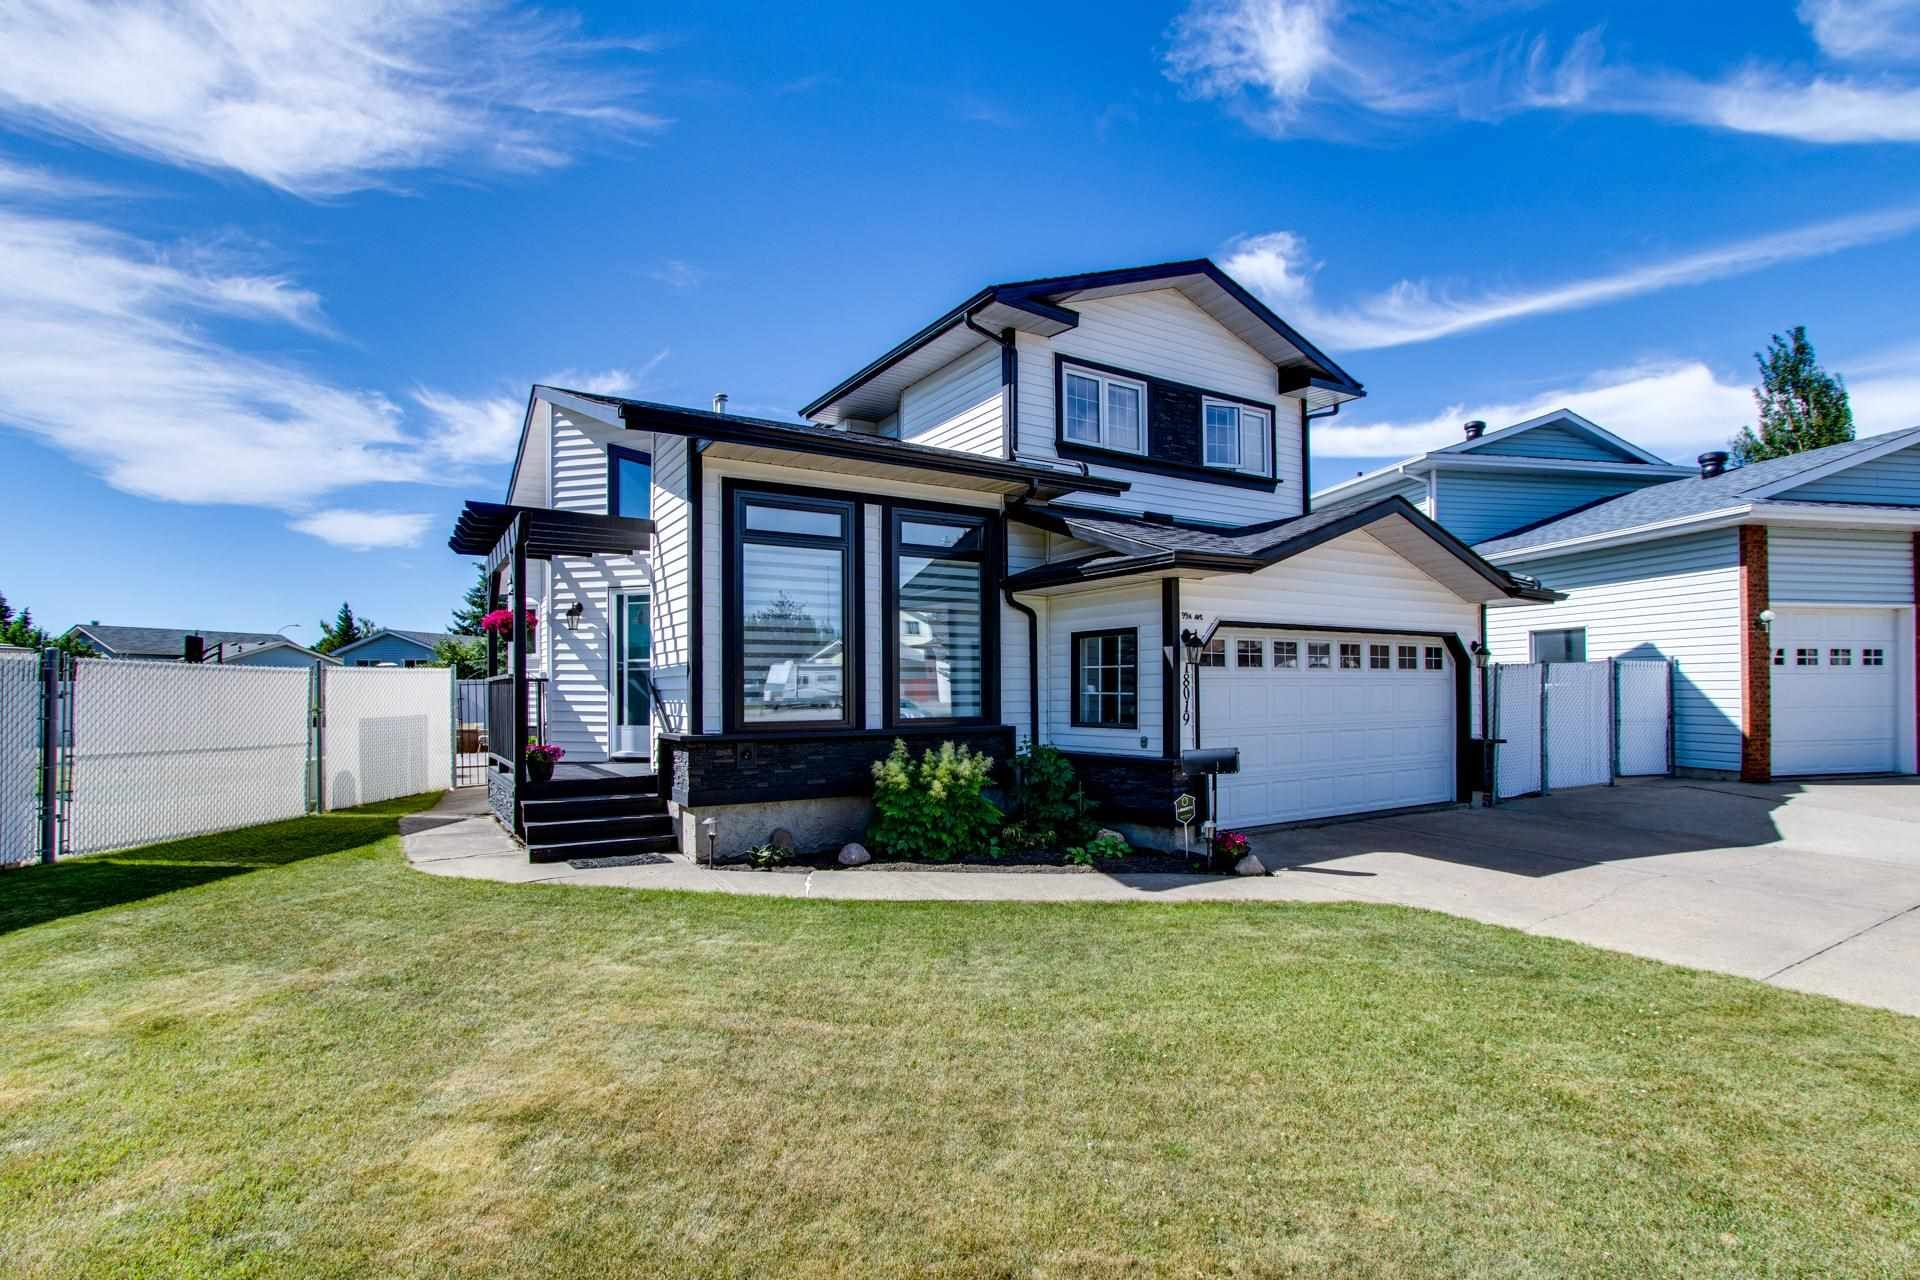 Main Photo: 18019 99A Avenue in Edmonton: Zone 20 House for sale : MLS®# E4265153